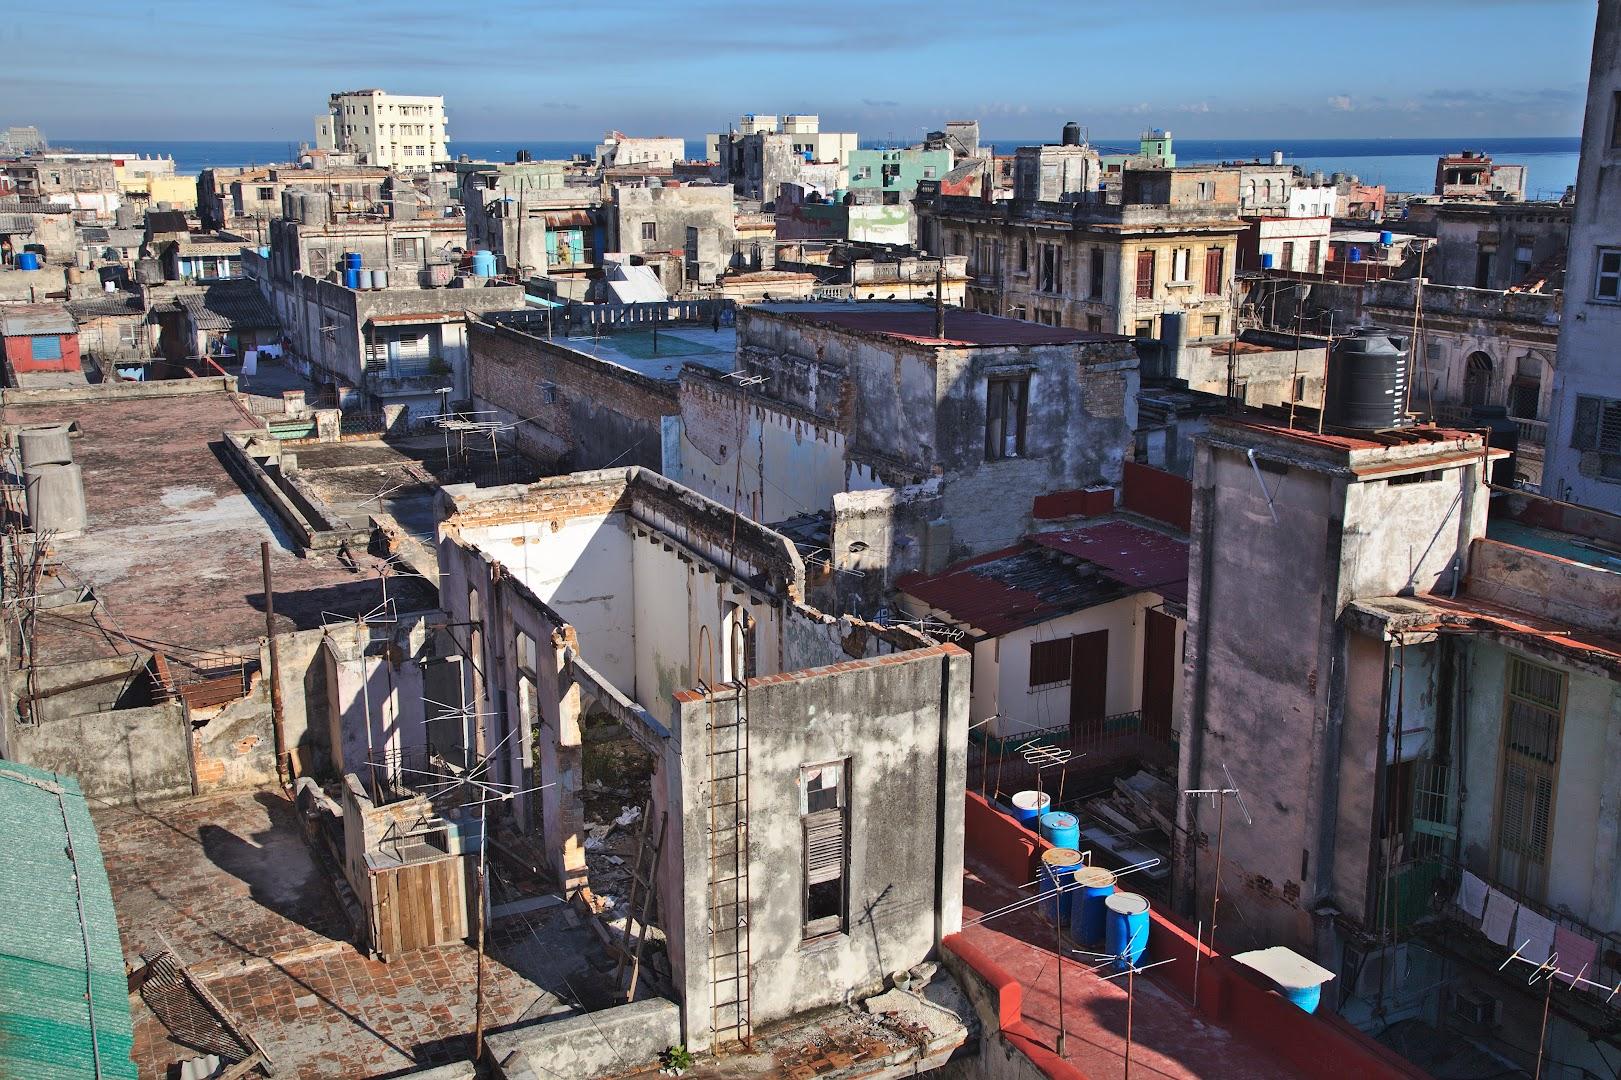 The roofs of Havana